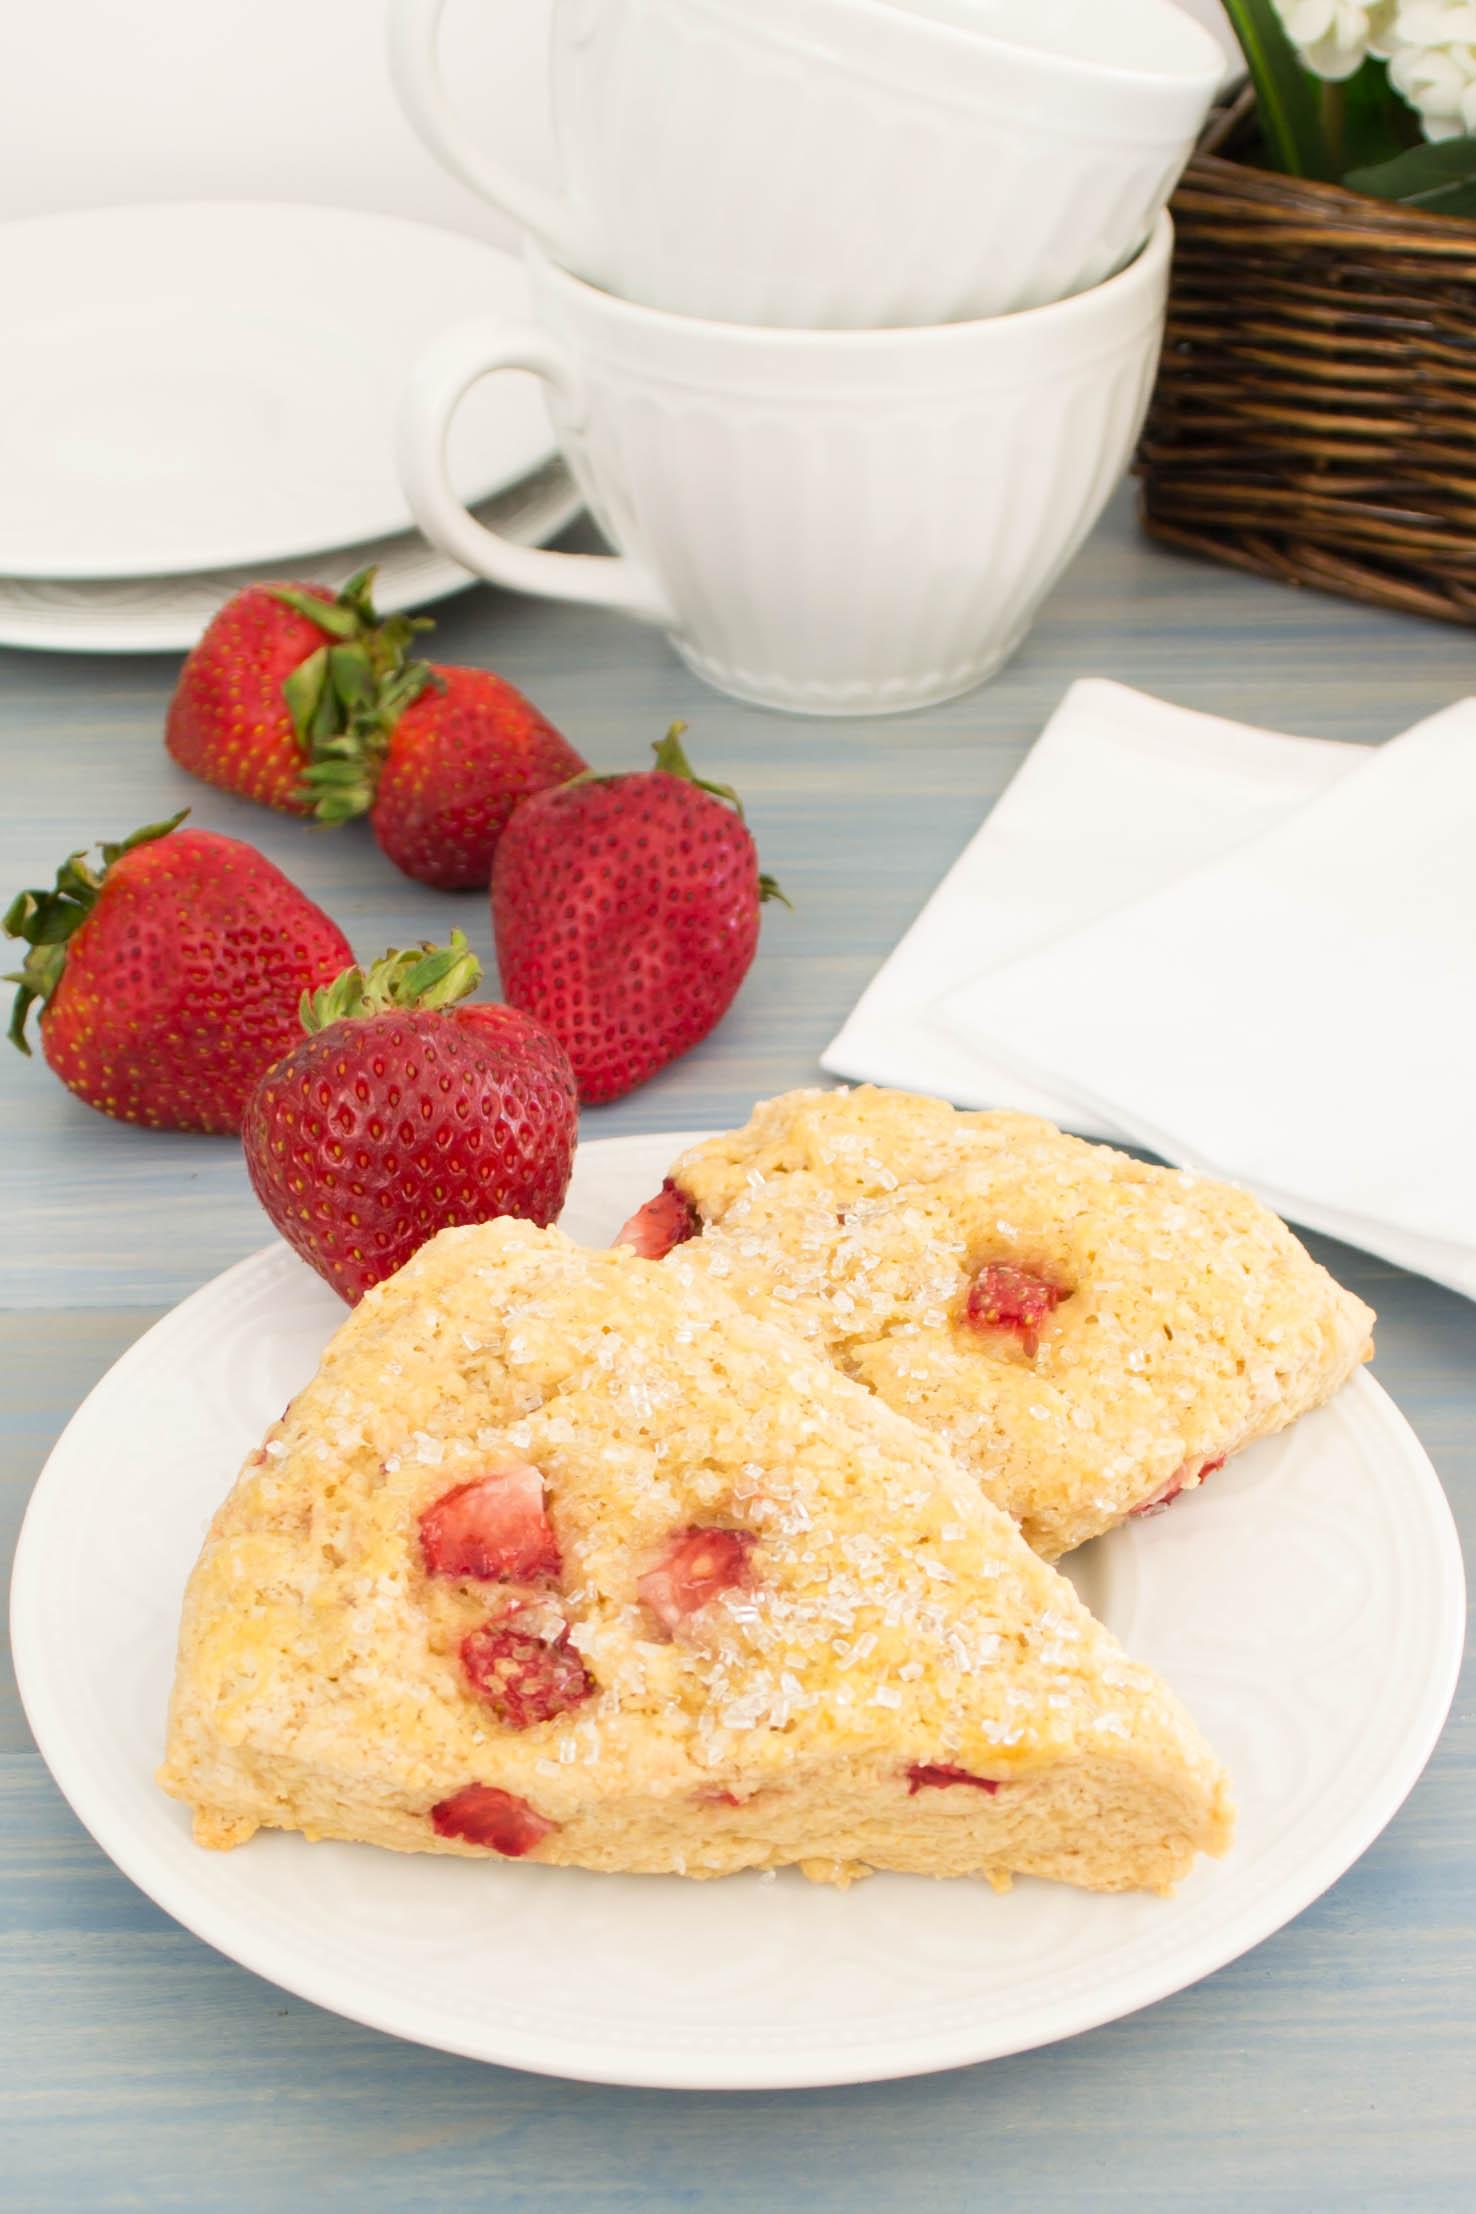 Whole Foods Strawberry Shortcake Price